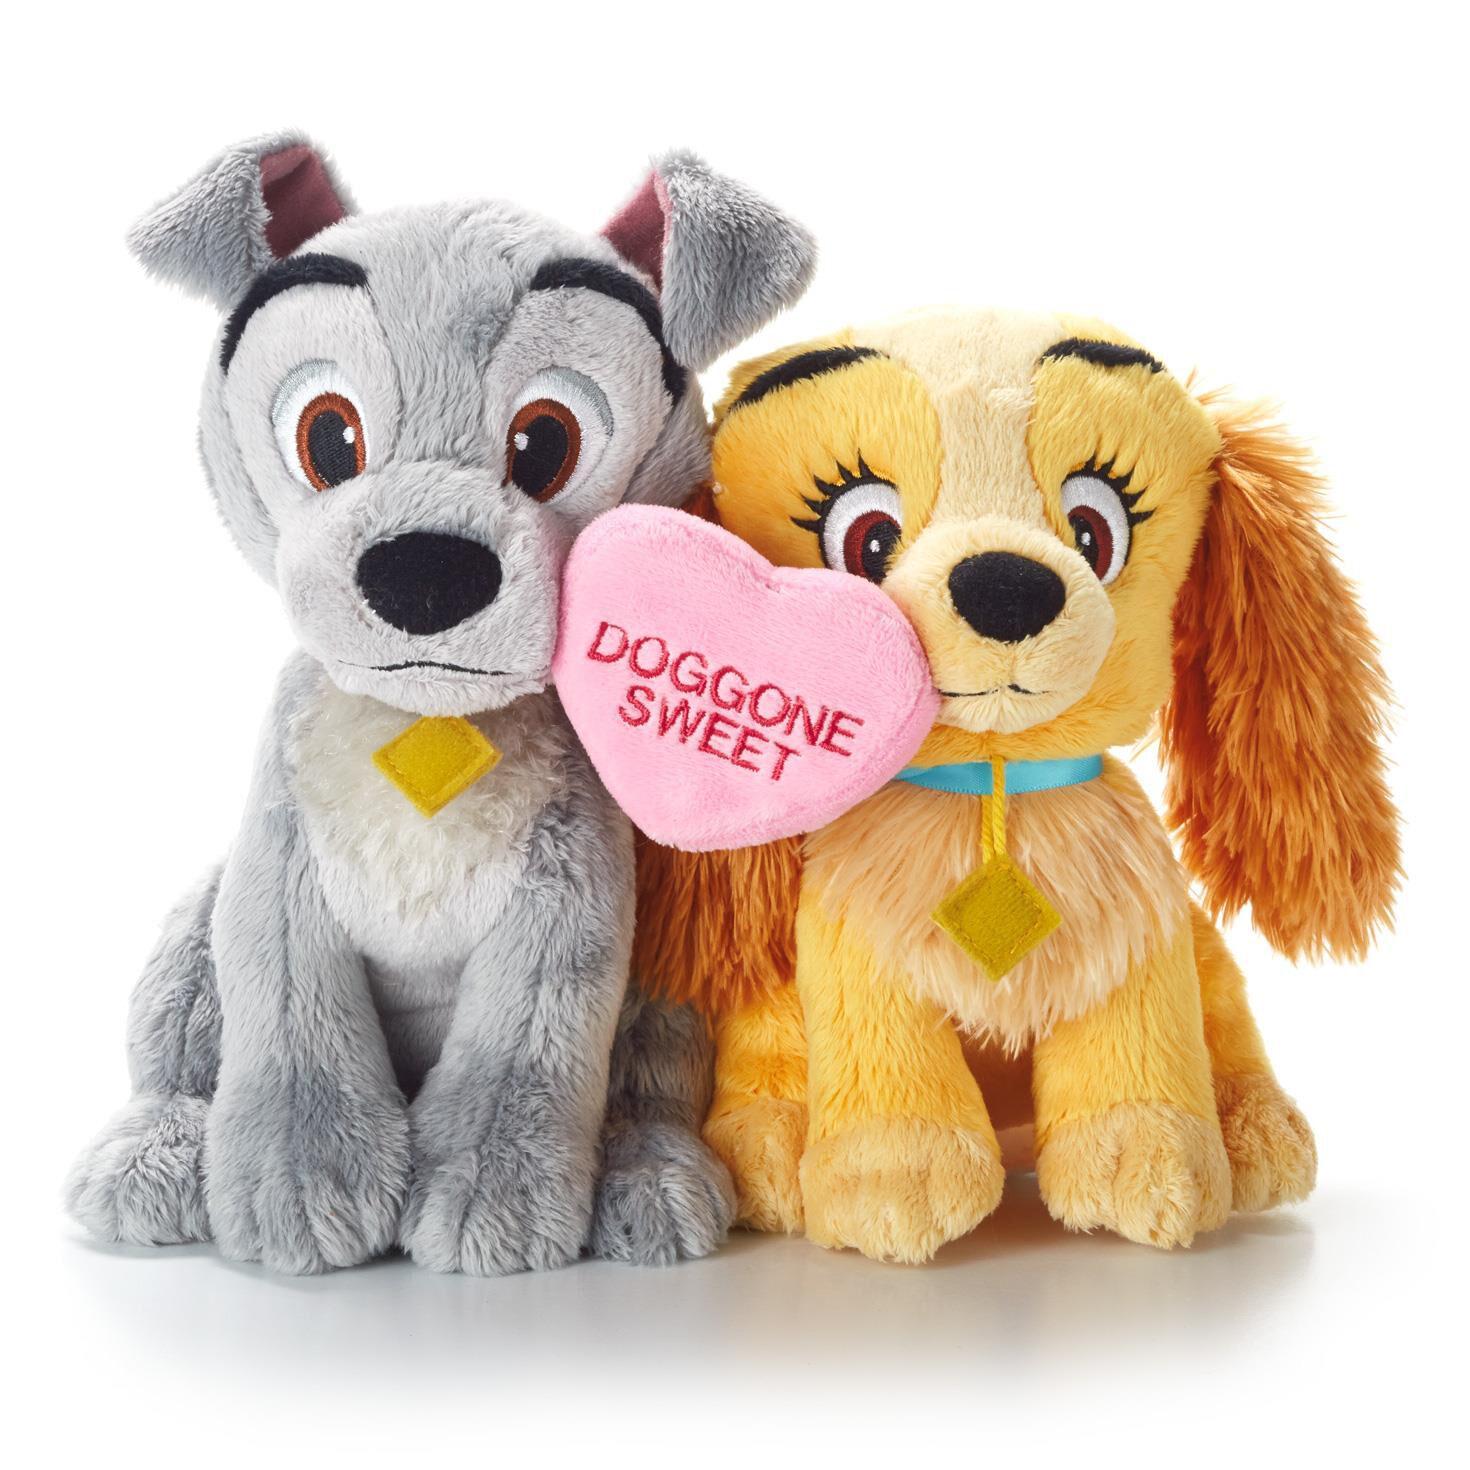 Doggone Sweet Lady And The Tramp Stuffed Animal Hallmark